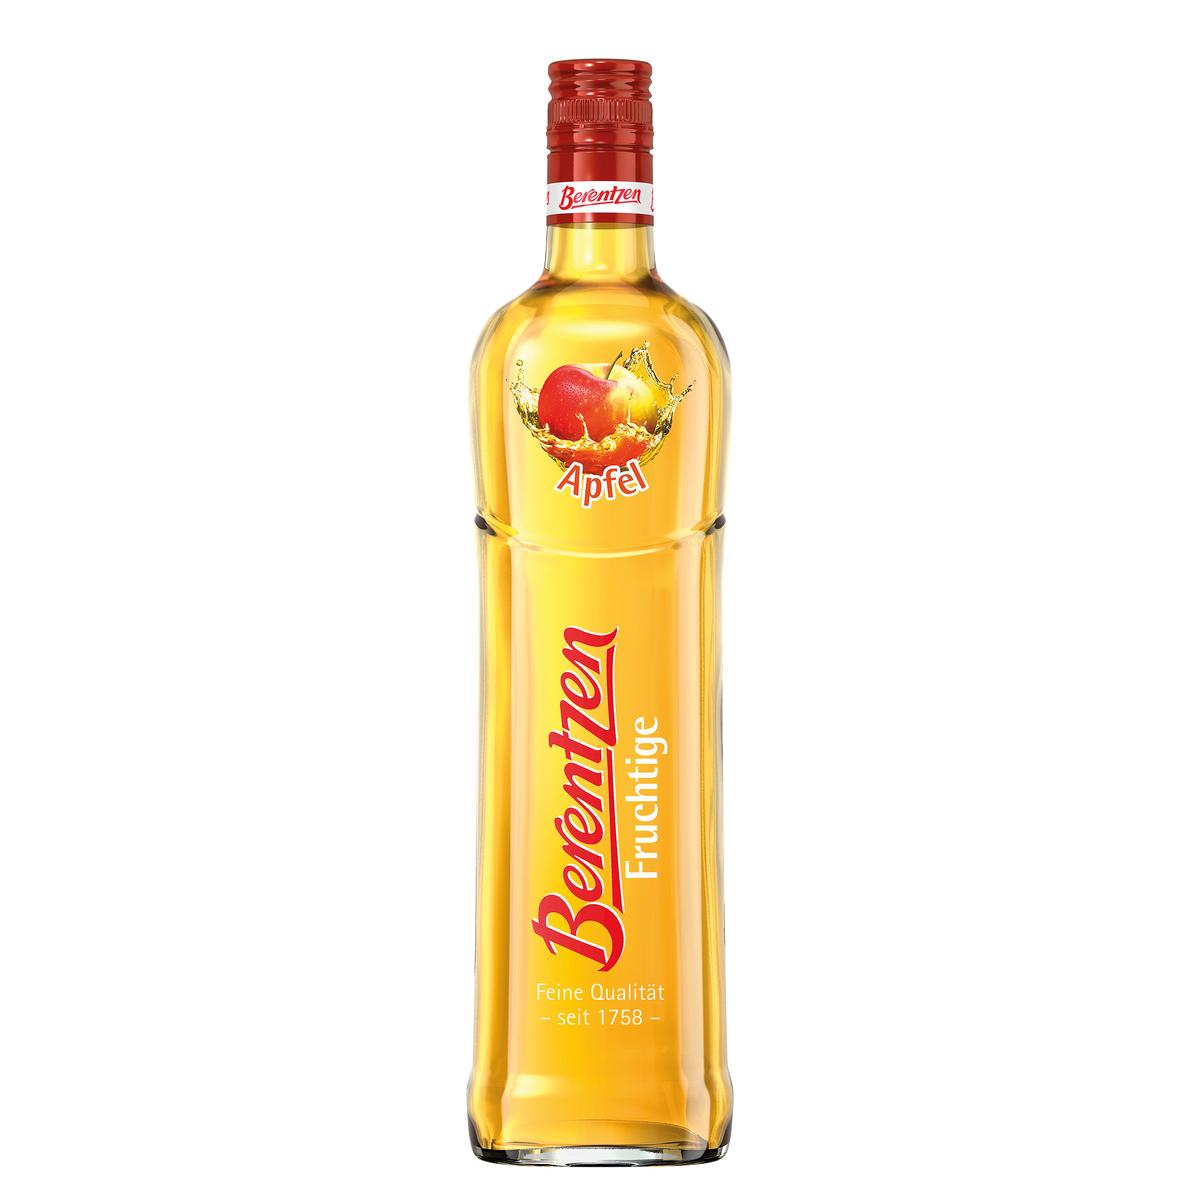 Berentzen Apfel 18% 0,7L   Liköre   Spirituosen   Sortiment   Trinkgut